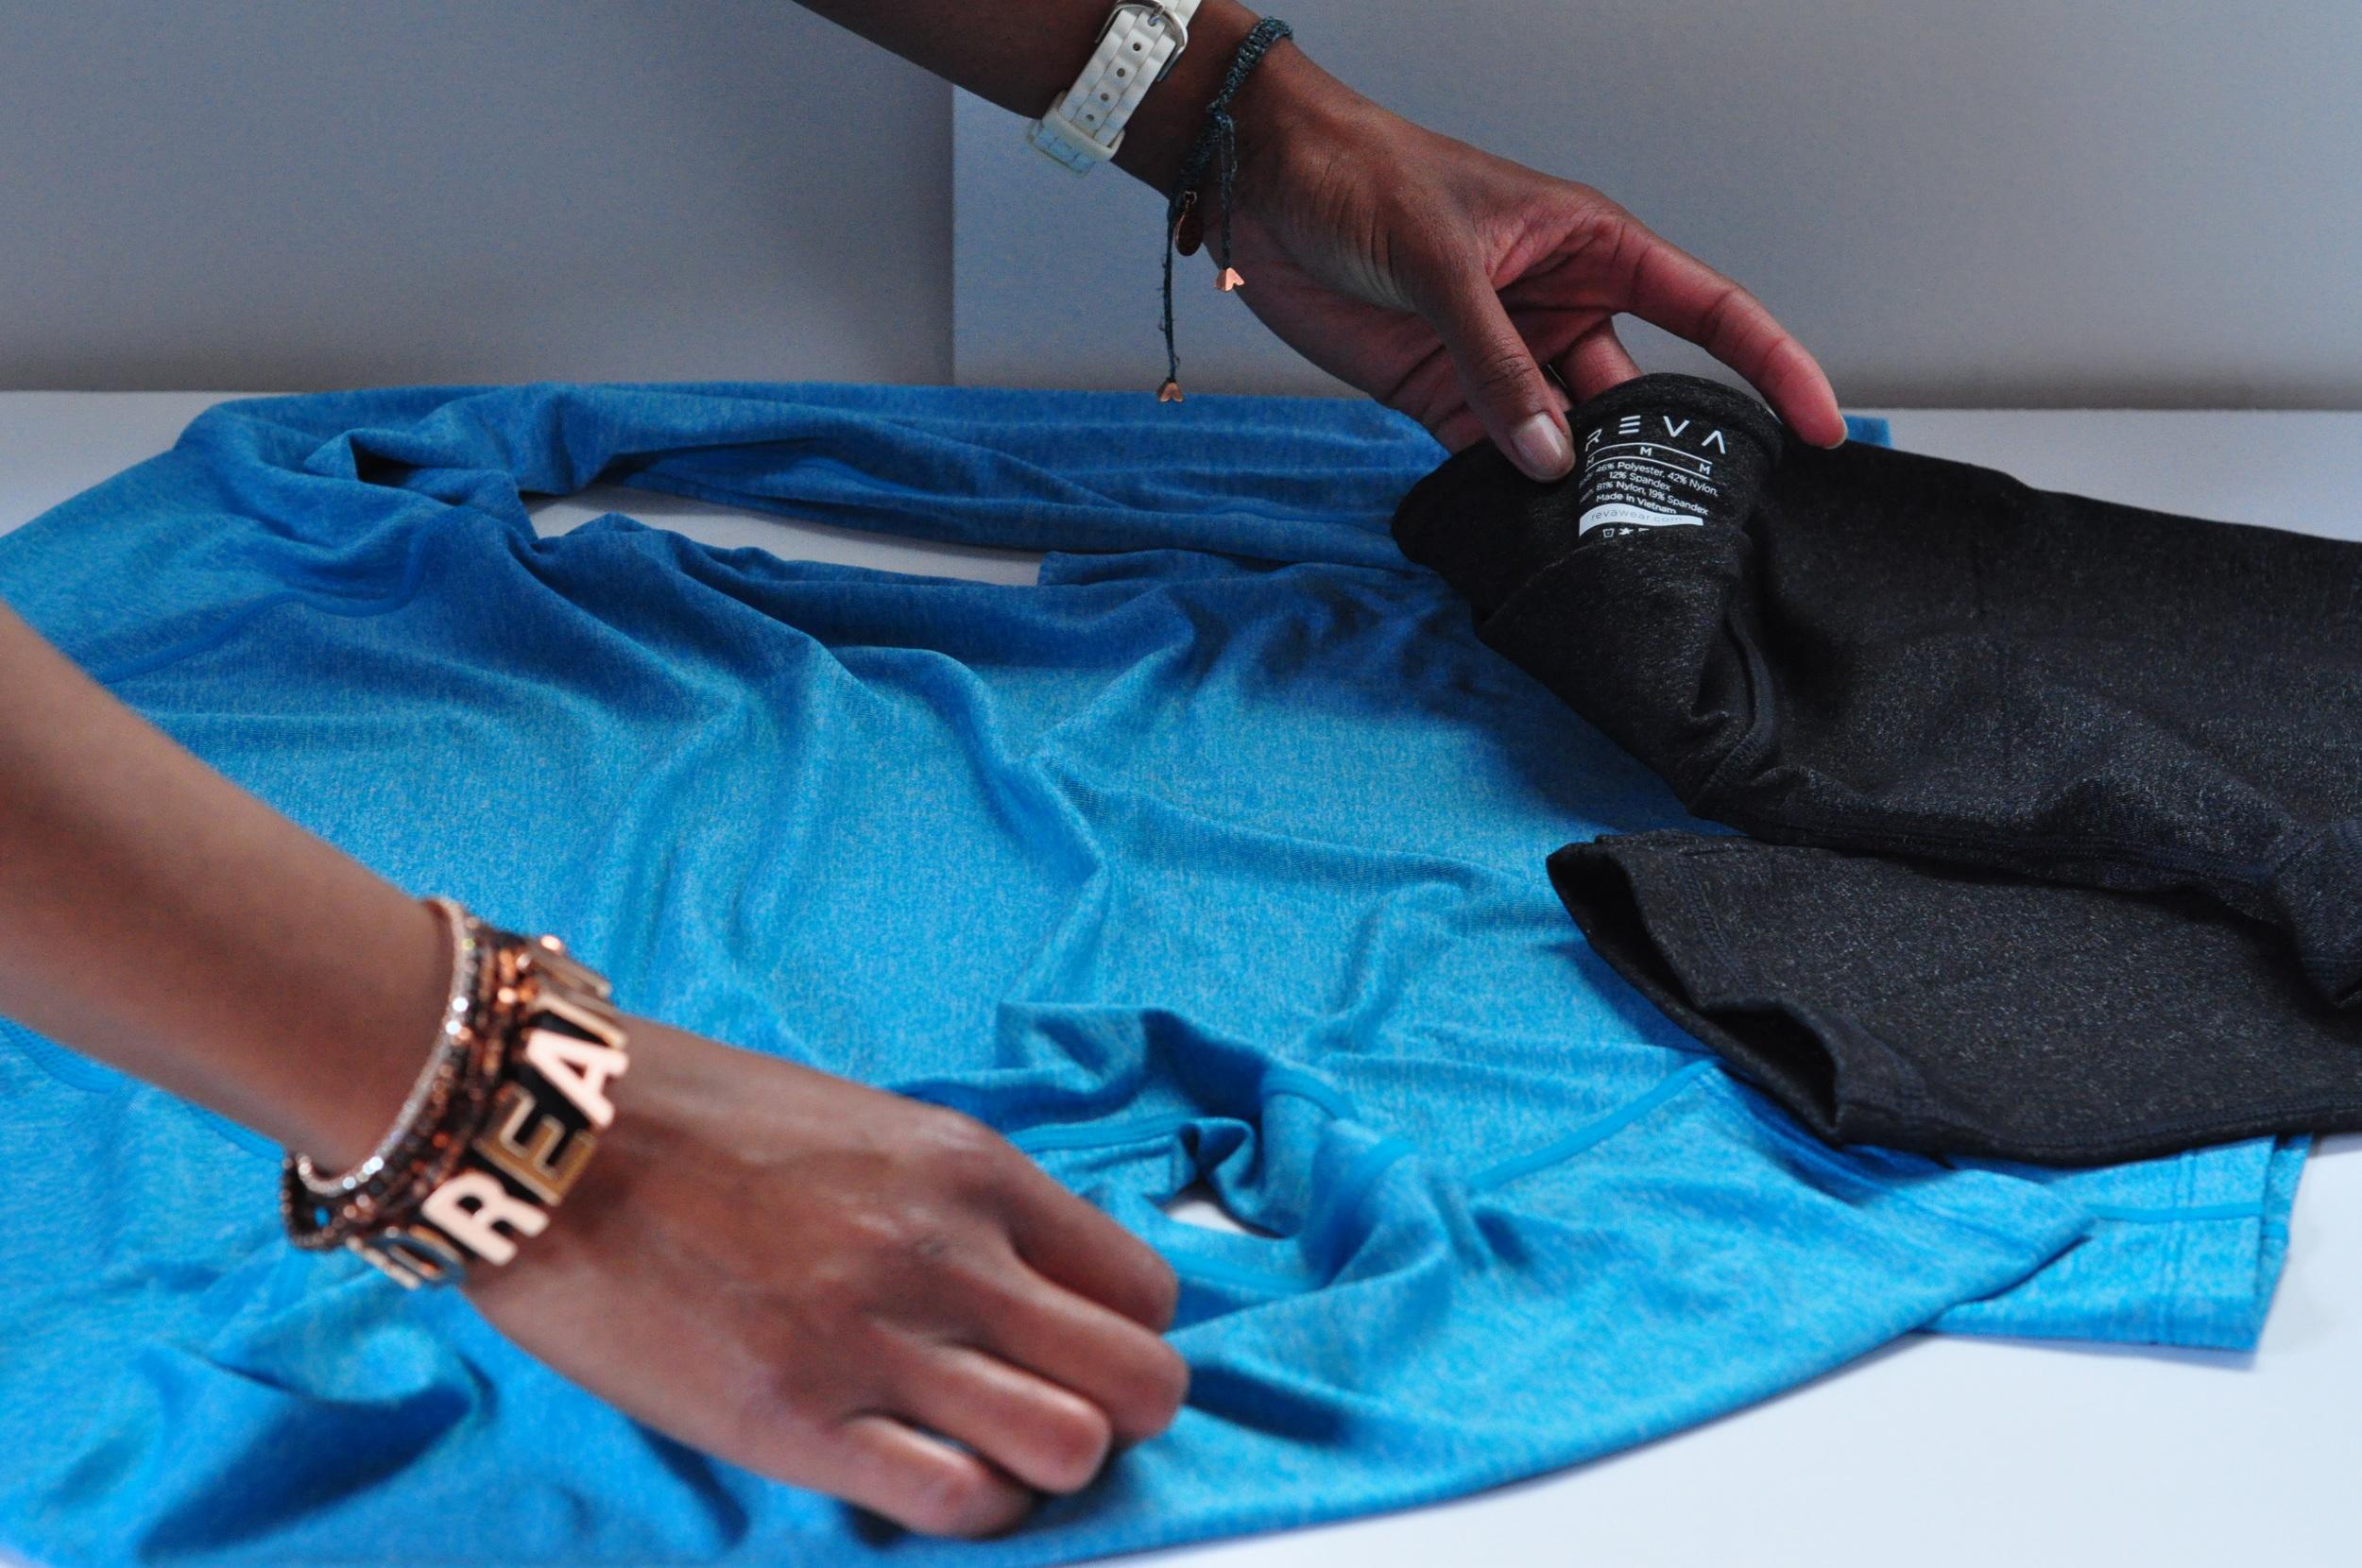 Styling Reva Wear's Challenge Me Tee & Vitality Capri for photo shoot